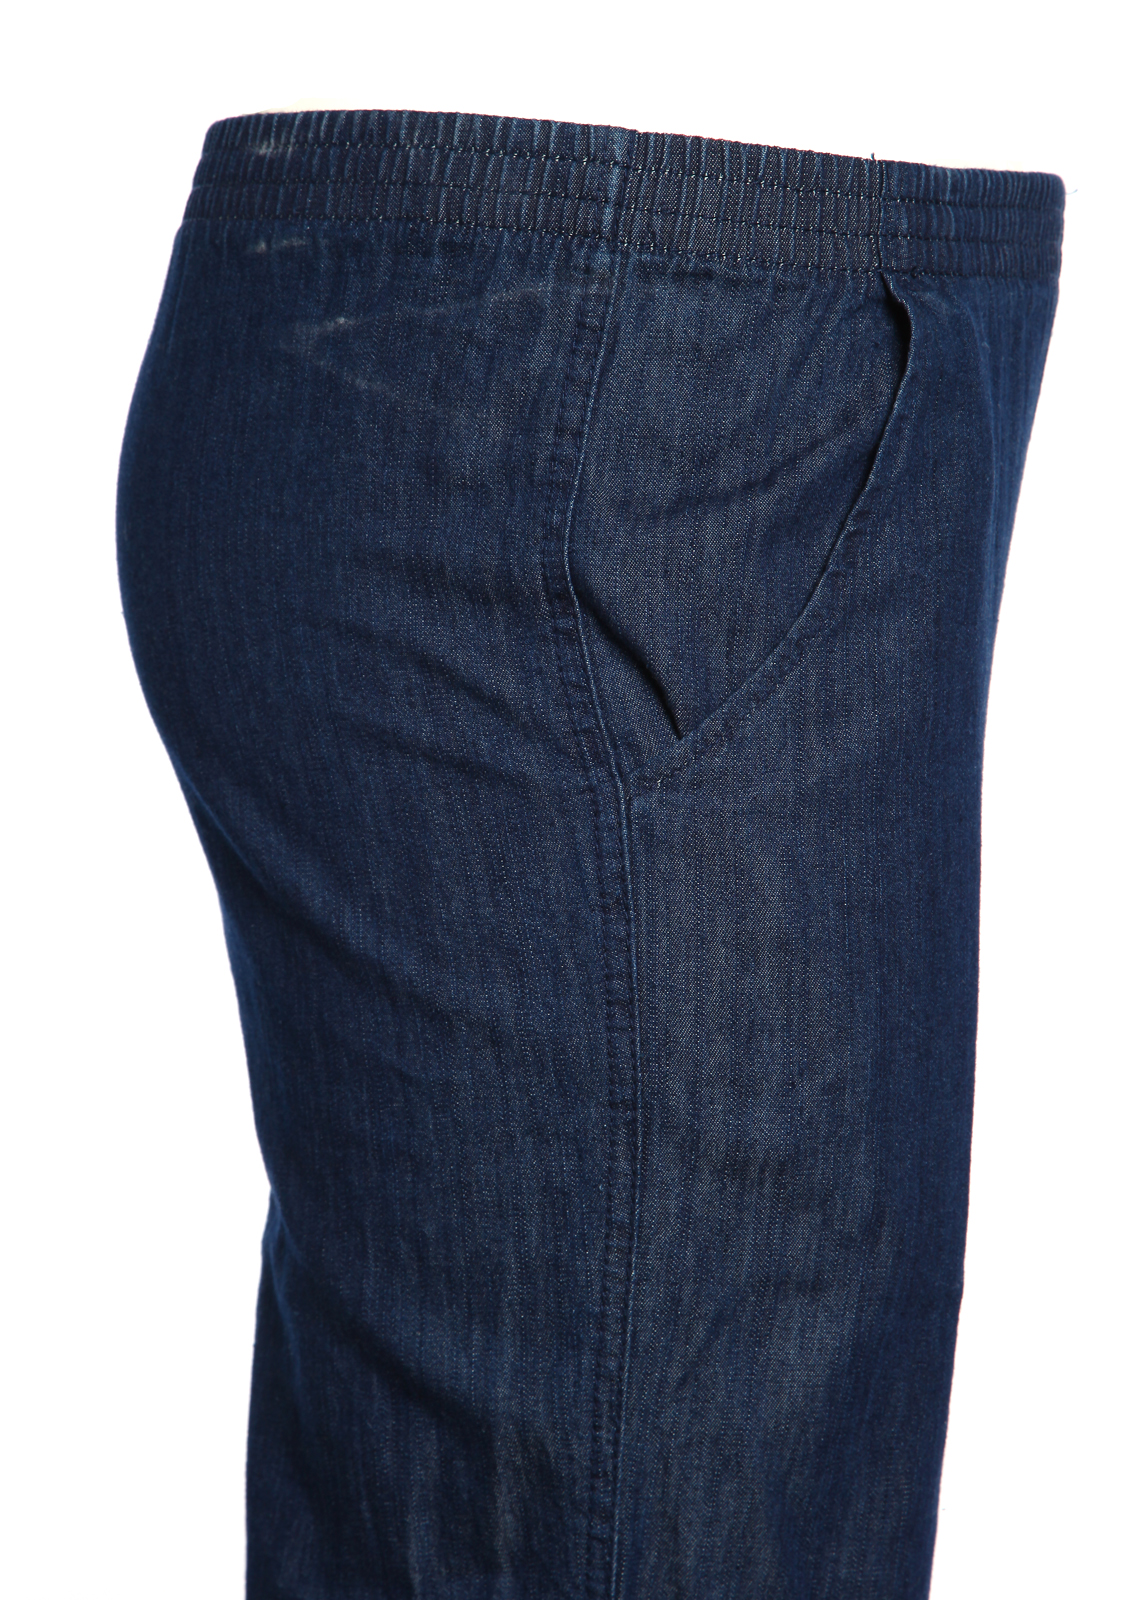 Koret Women Elastic Waist Relax Denim Relax Jeans Cropped ...